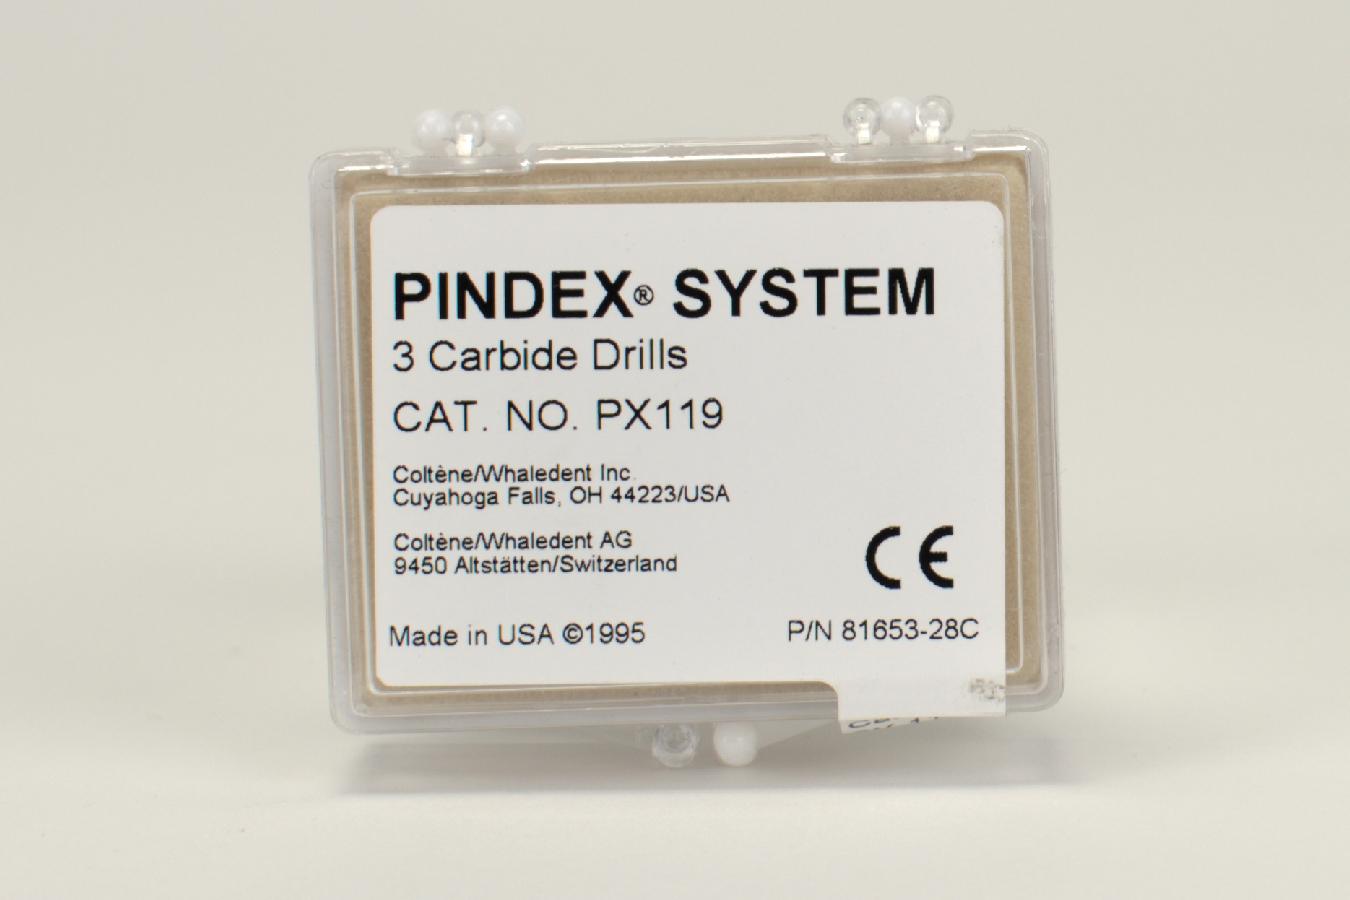 Pindex Karbid-Bohrer PX119 3 Stück